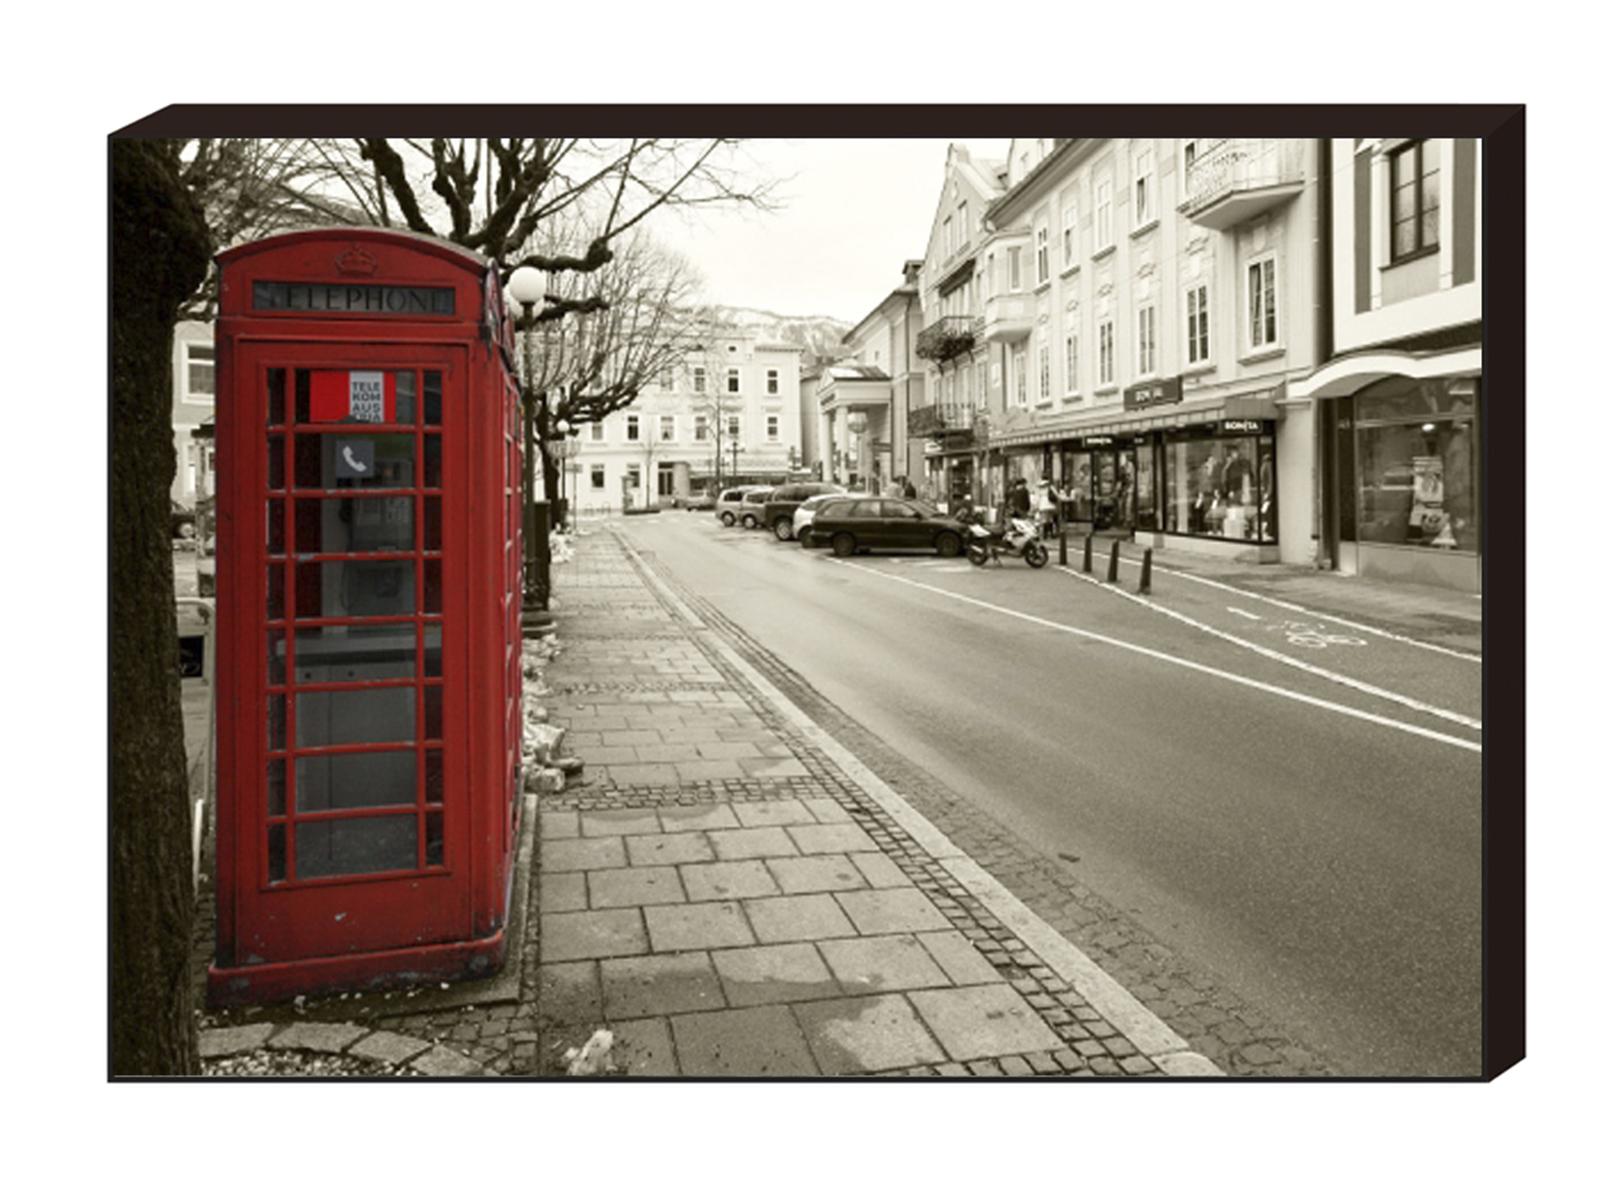 Постер Red telephone box 1, 900х600 A-12882 ОГОГО Обстановочка!